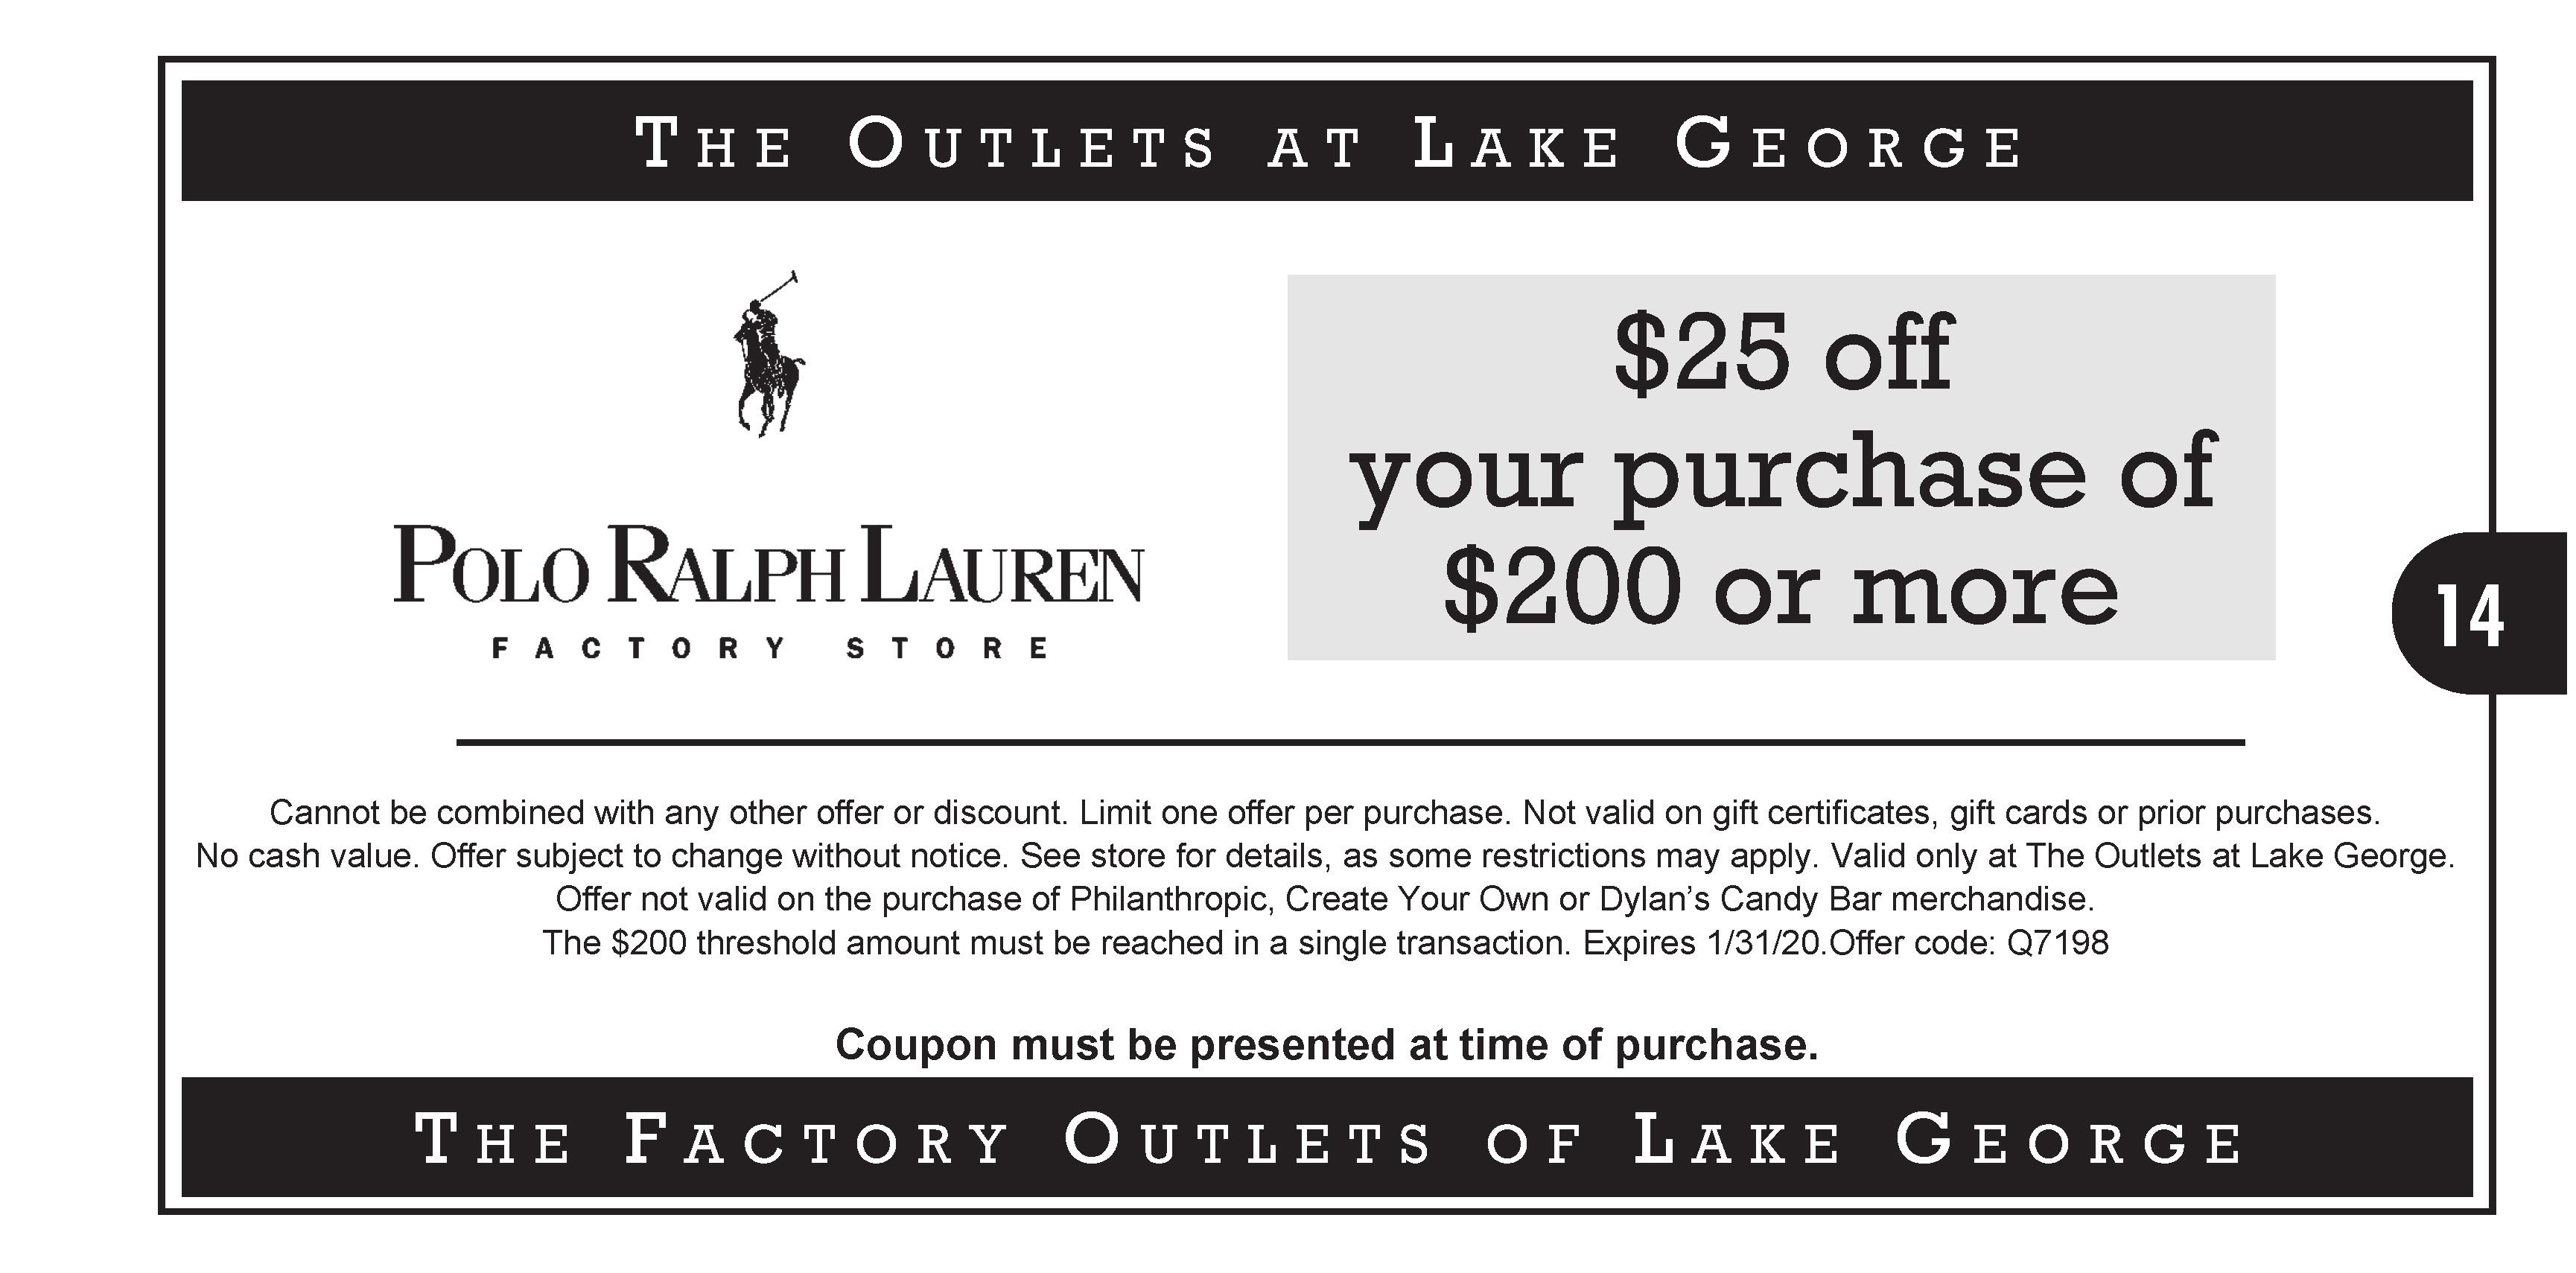 Polo Ralph Lauren Factory Outlet